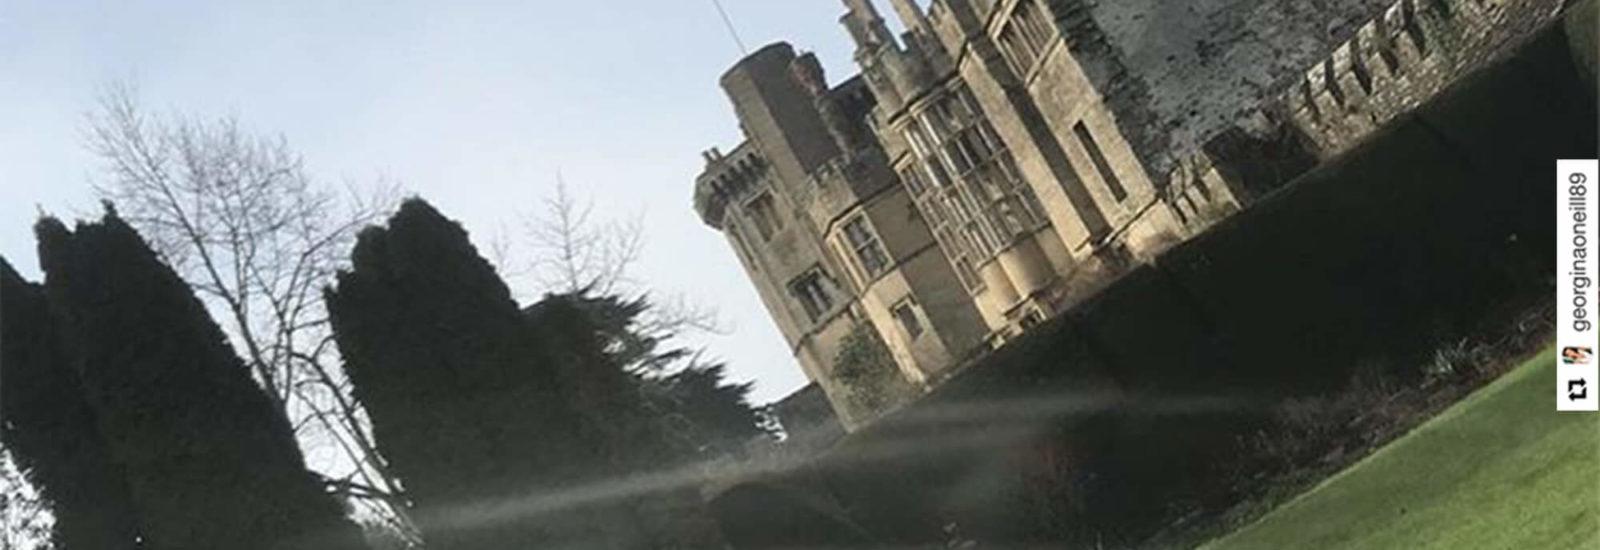 Image of Thornbury Castle